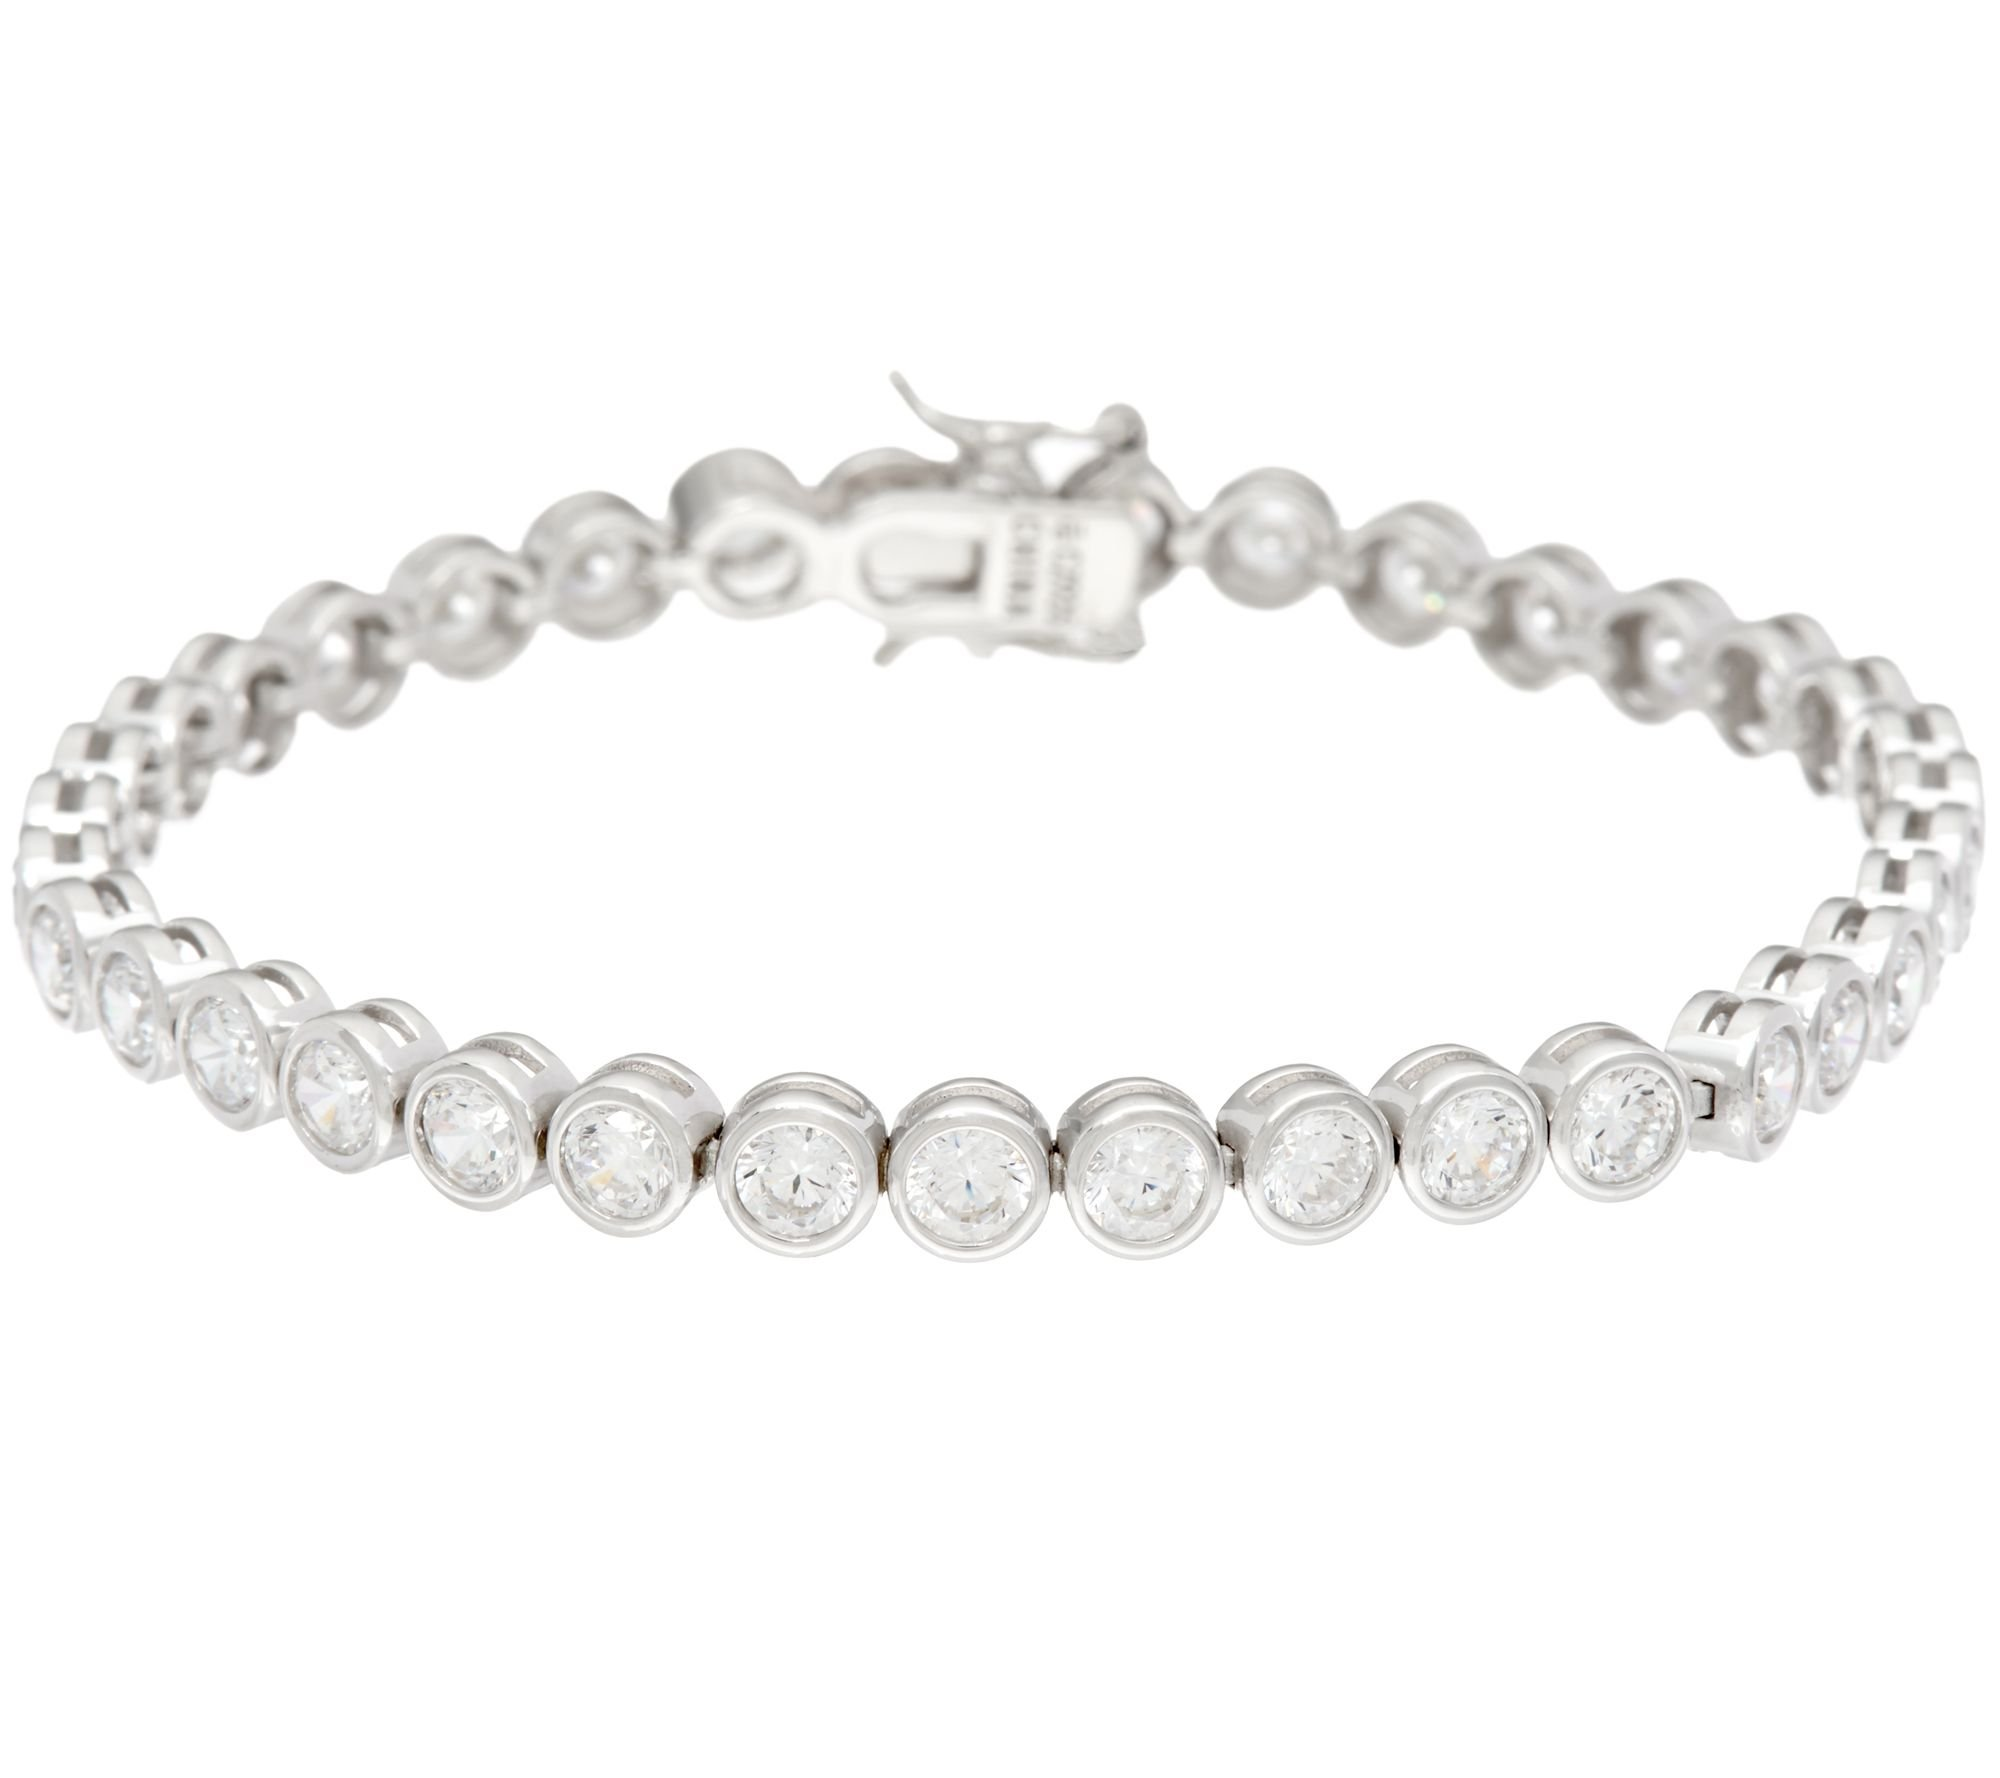 Silvostyles 7.60 Carat Round Bezel Set D/VVS1 Diamond 14K White Gold Plated Tennis Bracelet